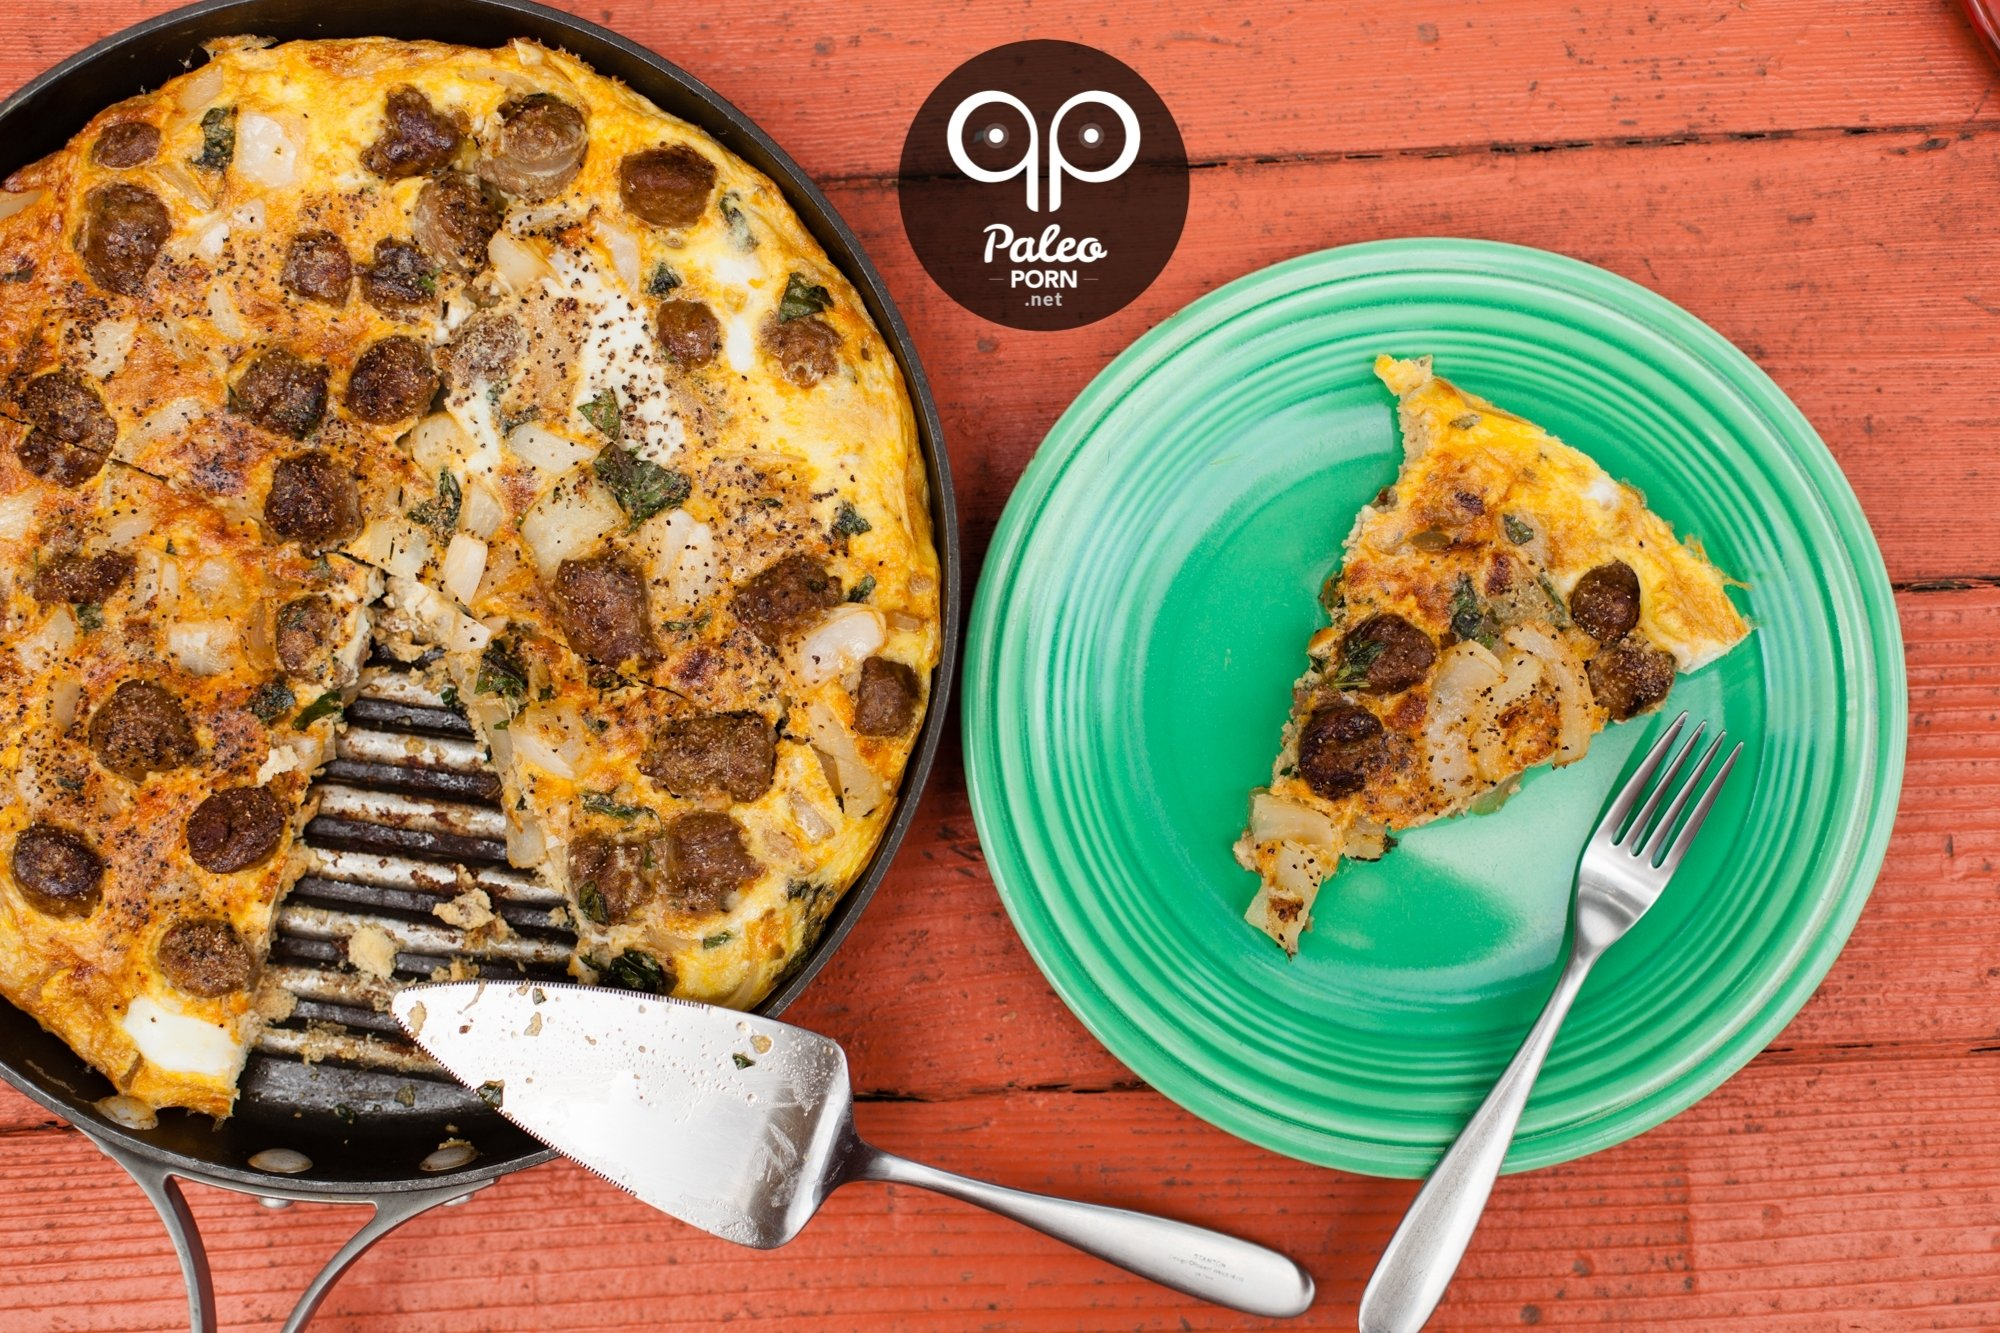 10 Stunning Paleo Breakfast Ideas On The Go paleo breakfast pizza with lamb chorizo paleo porn steamy paleo 2020